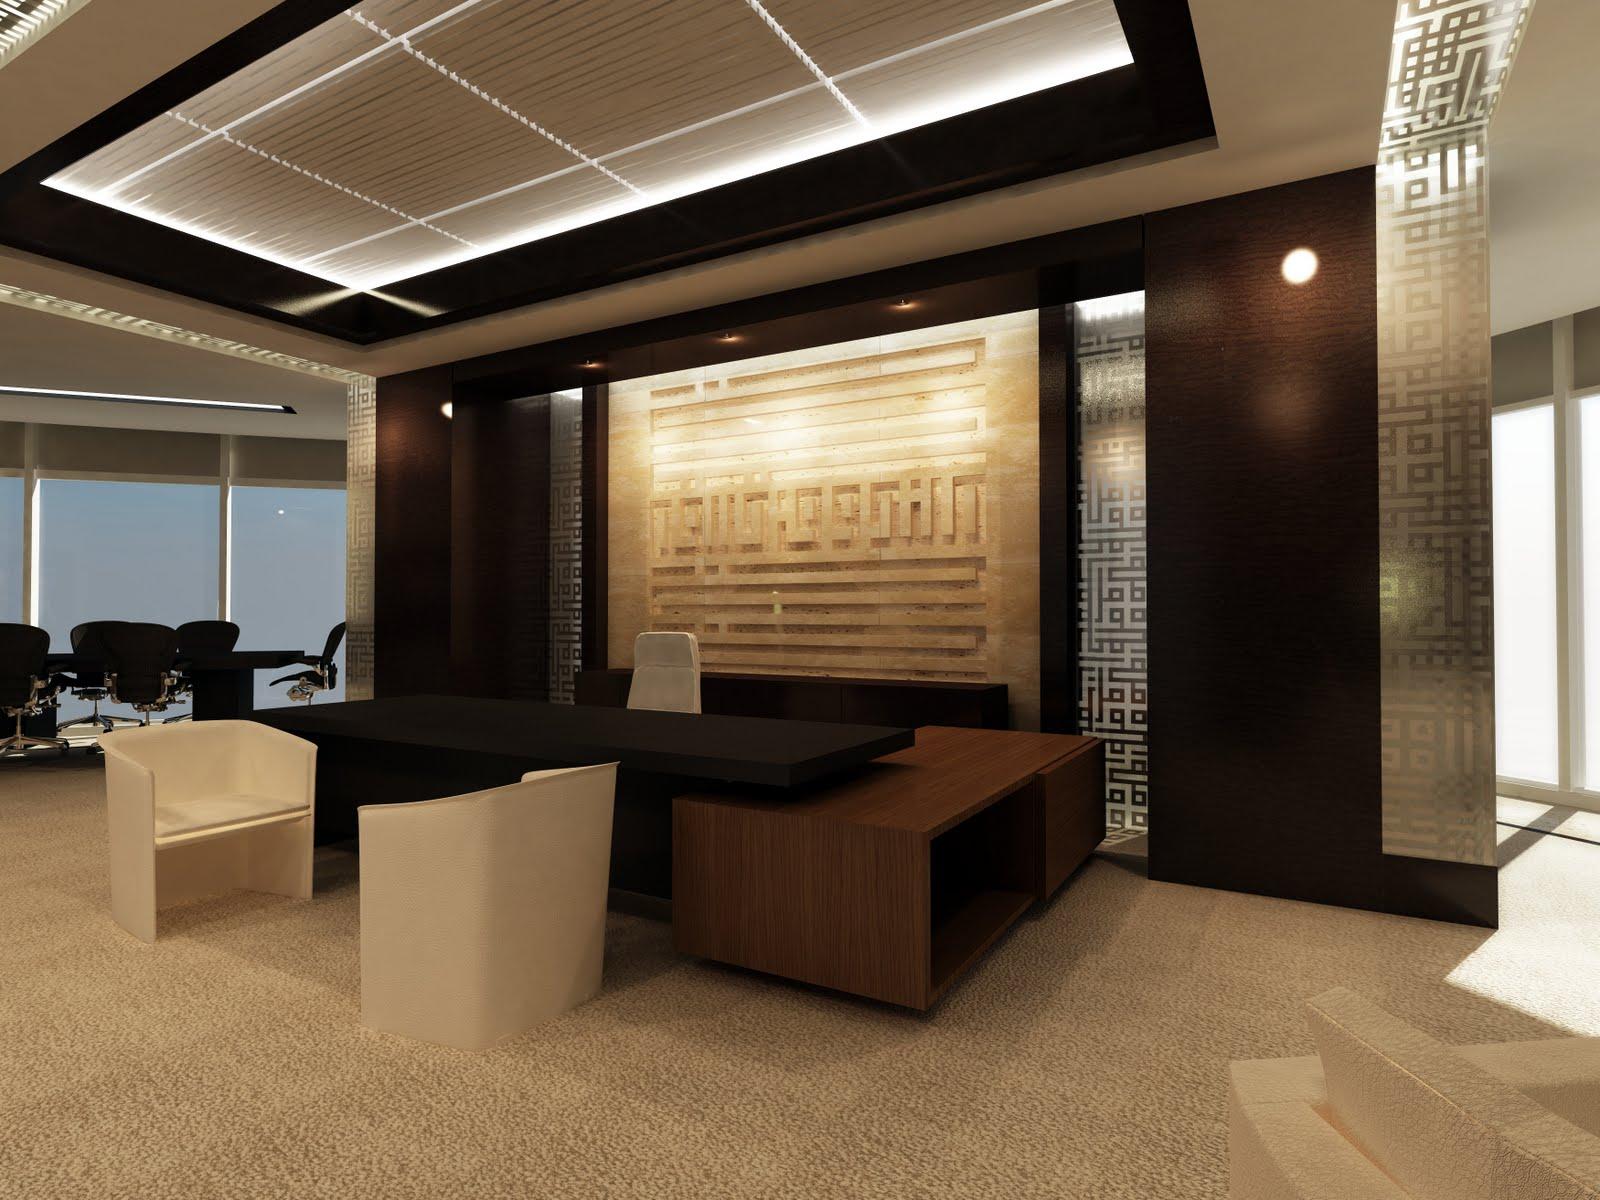 Tawazen interior design l l c khalifa fund office for Interior office designs pictures